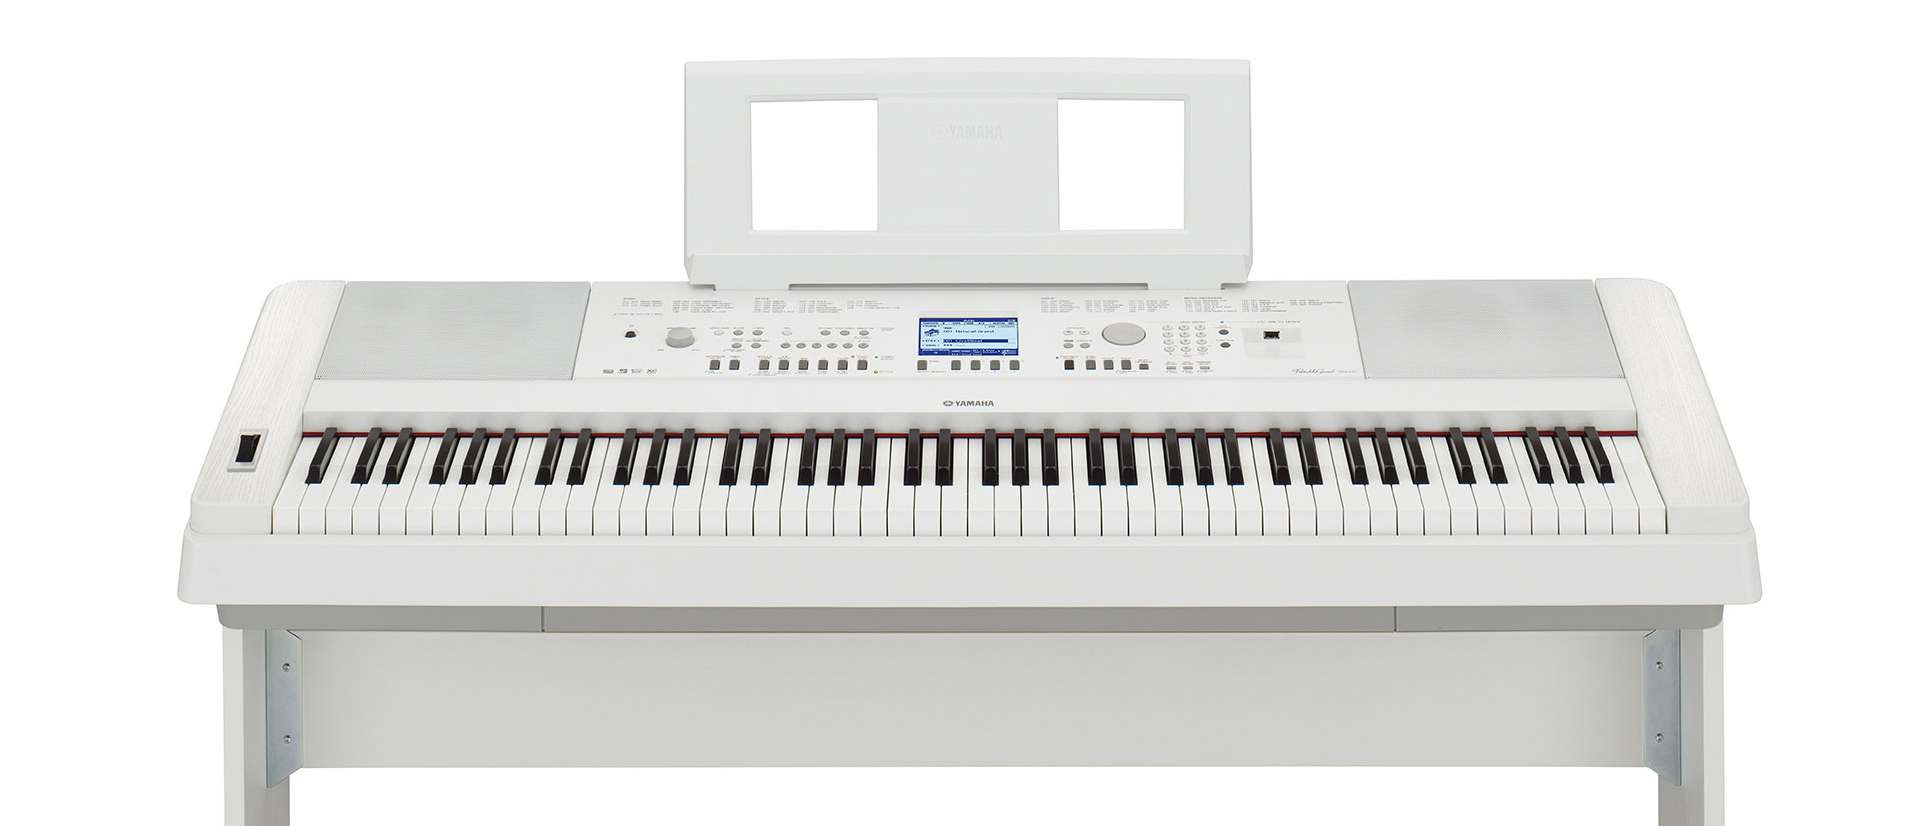 dan-piano-dien-yamaha-nao-tot-cho-nguoi-moi-hoc-8